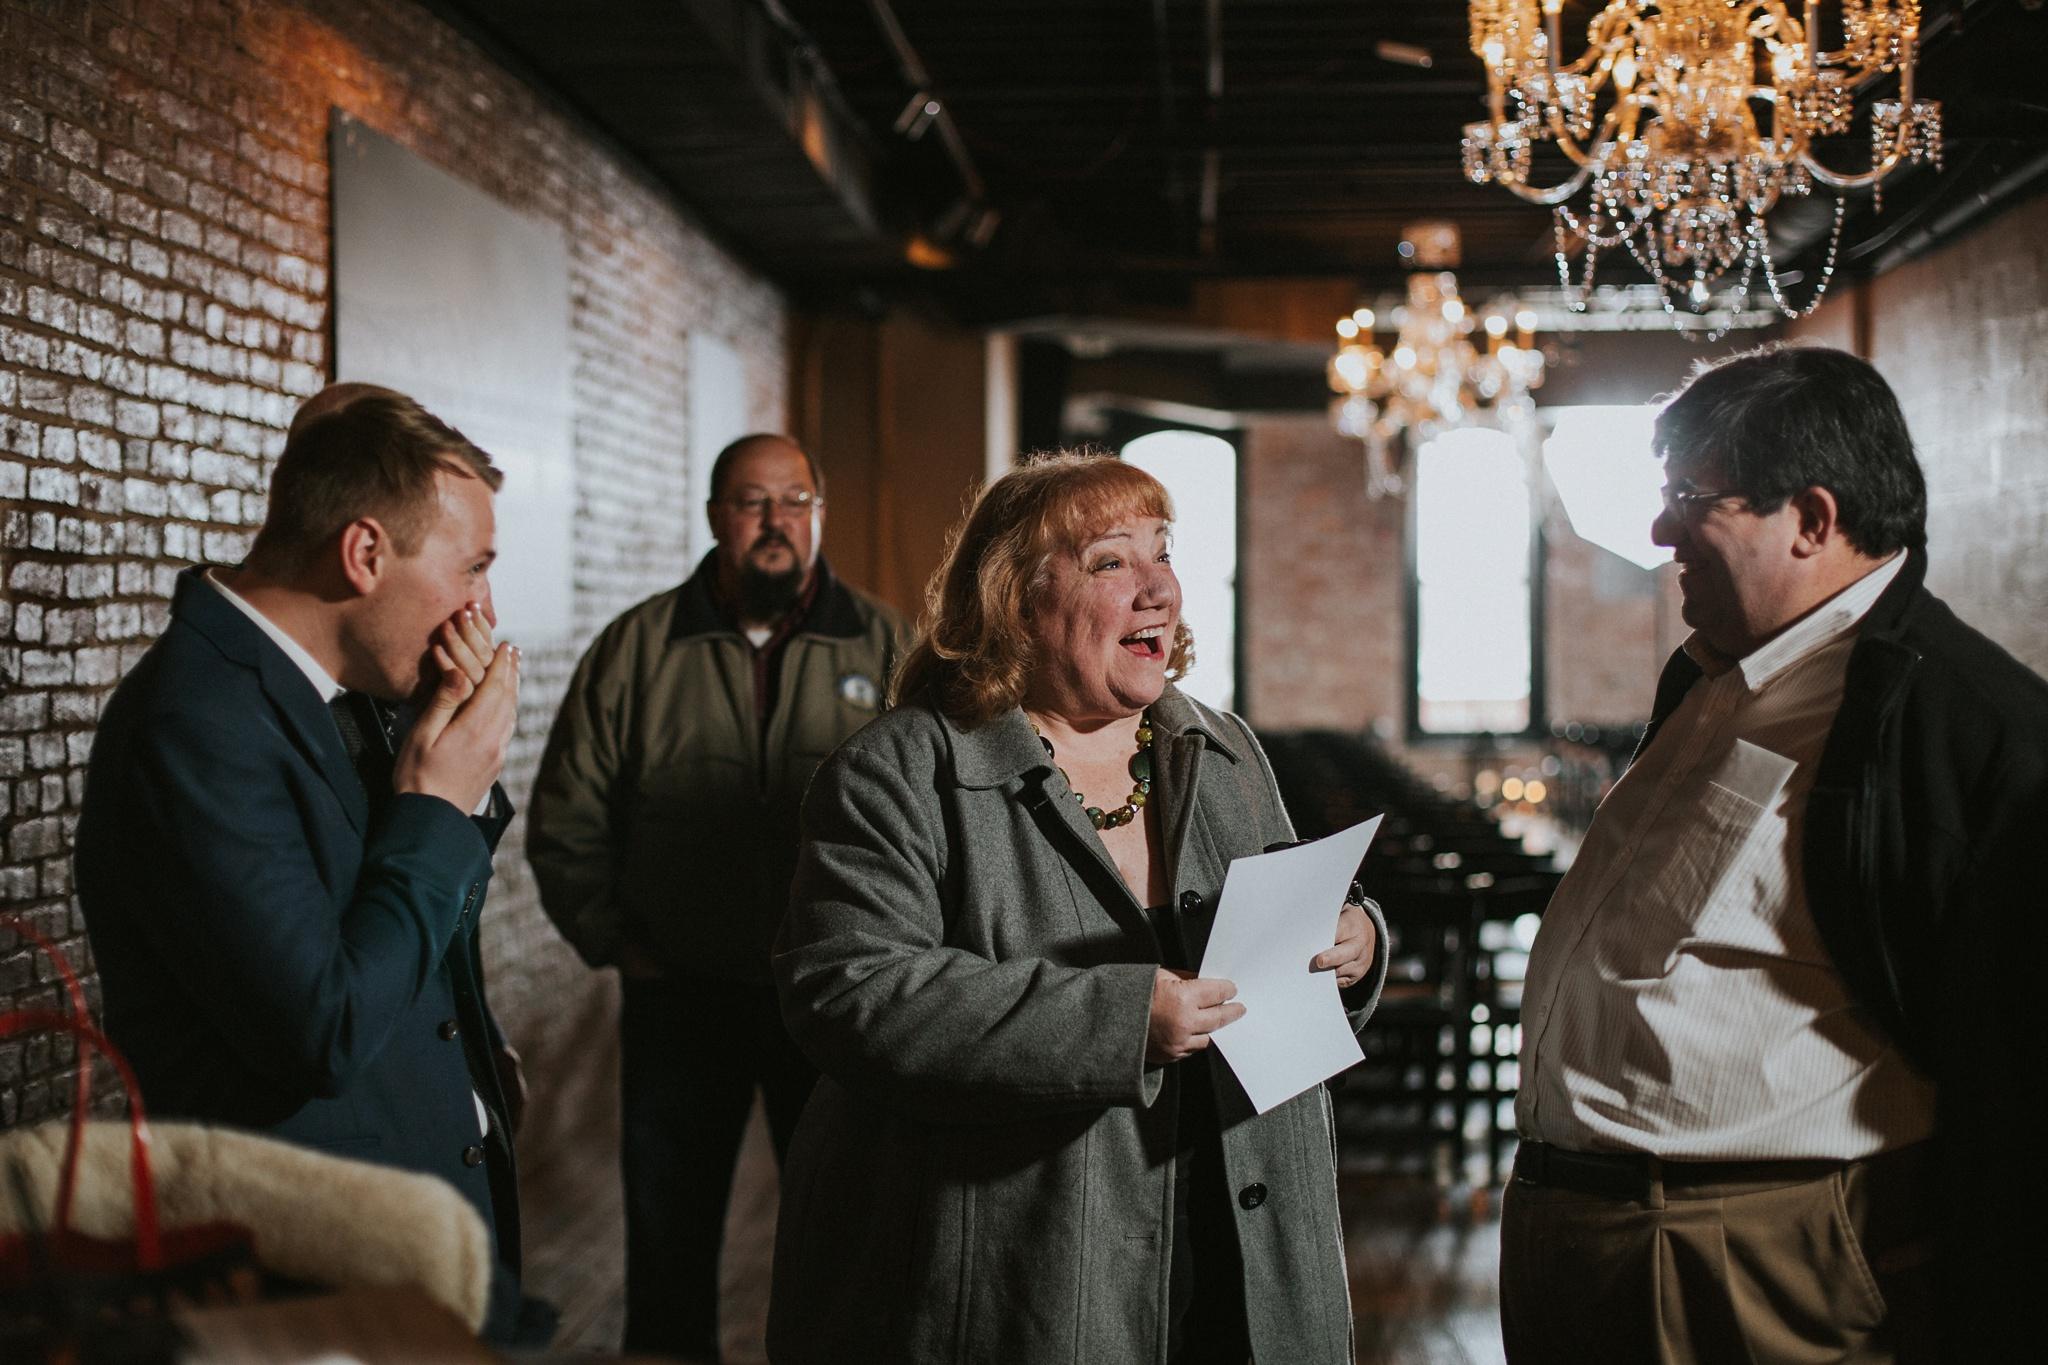 Downtown-Louisville-Surprise-Wedding_0031.jpg